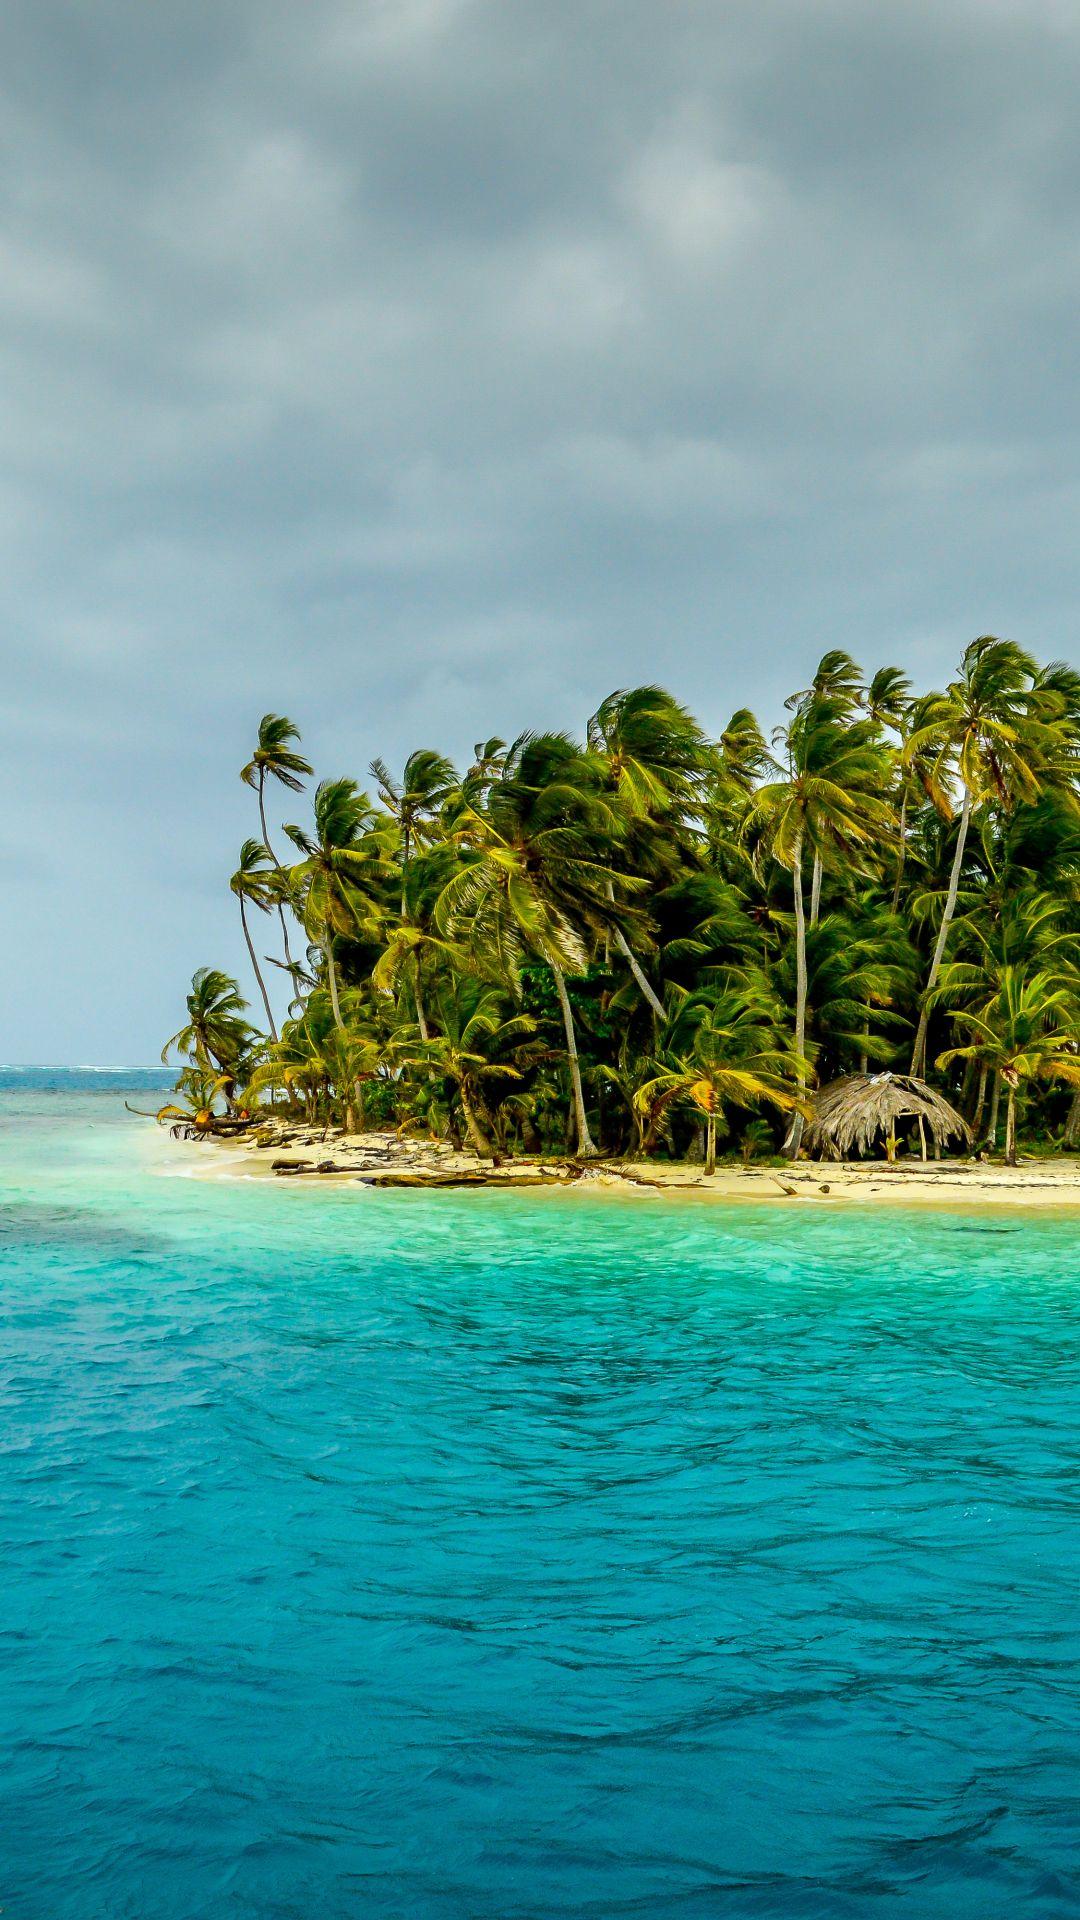 Tropical Island Earth Island Earth Horizon Island Palm Tree Tropical 1080x1920 Mobile Wallpaper Island Wallpaper Wallpaper Earth Beach Pictures